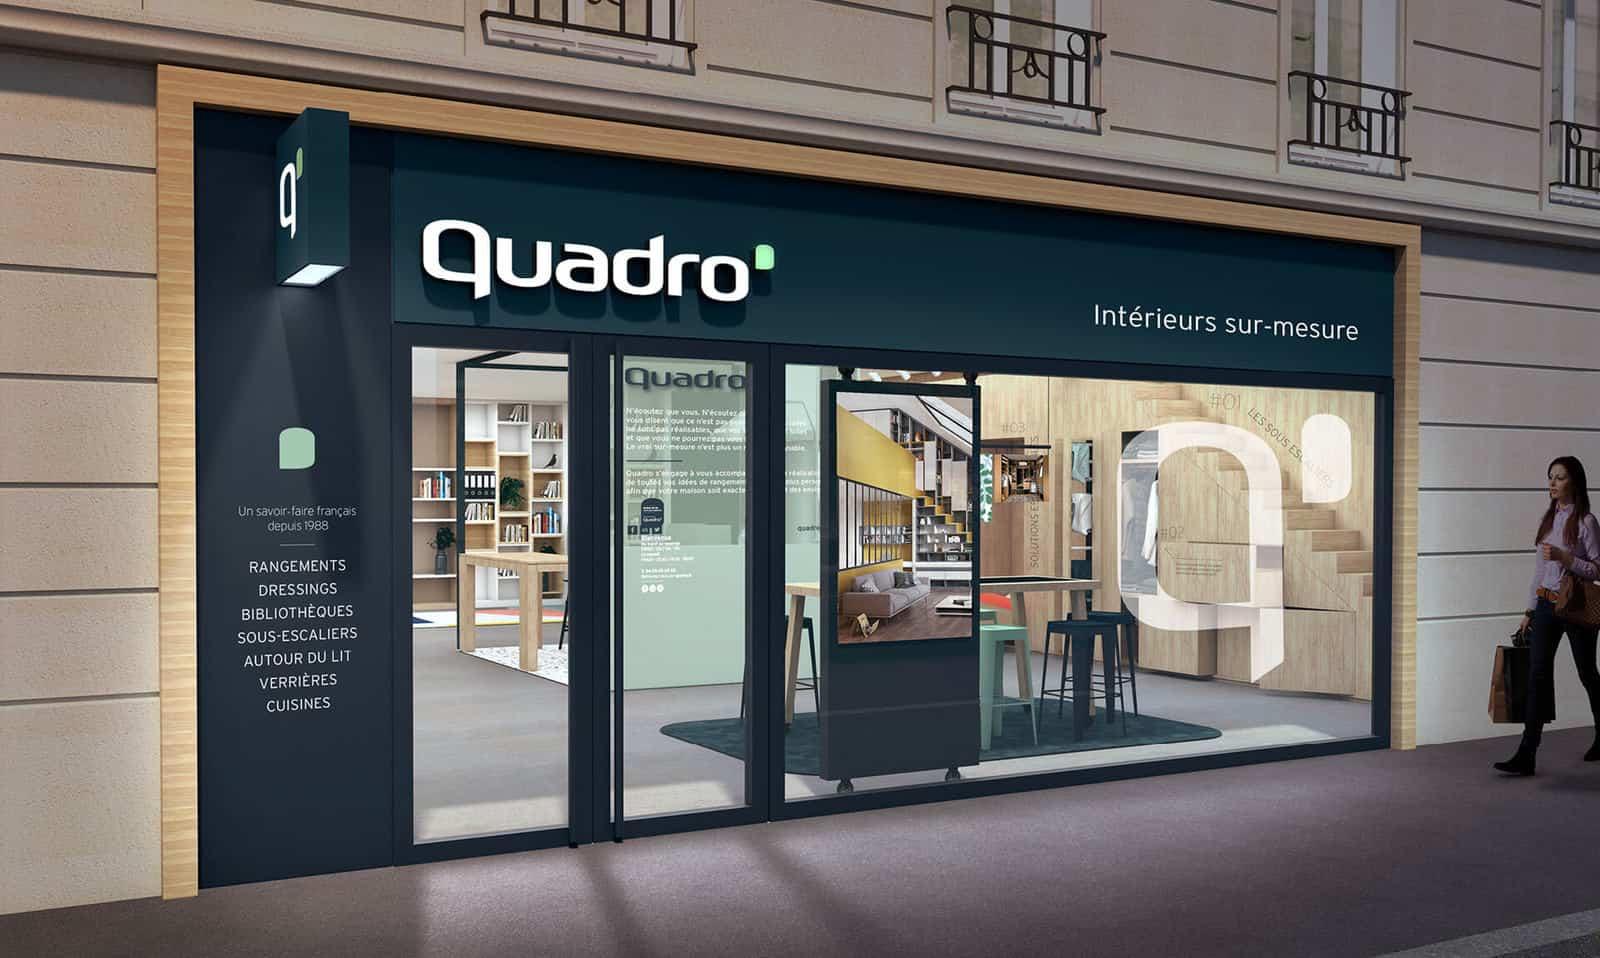 Bon Coin Sarthe Ameublement fusion avec agem : quadro comptera 50 magasins fin 2019